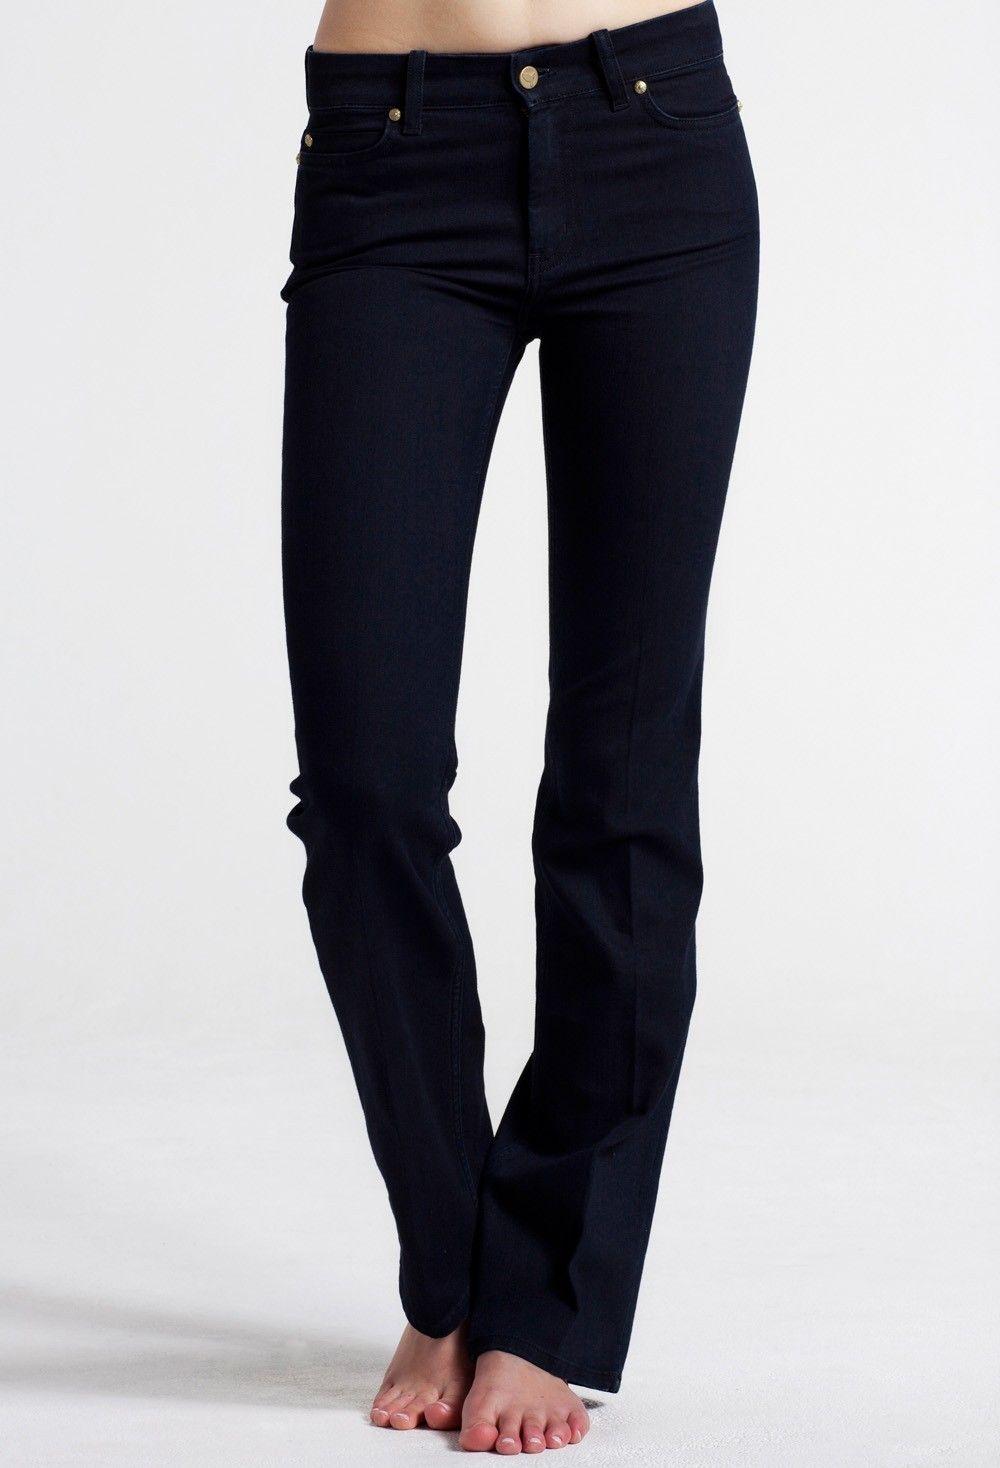 The MiH Jeans London bootcut in Kara.